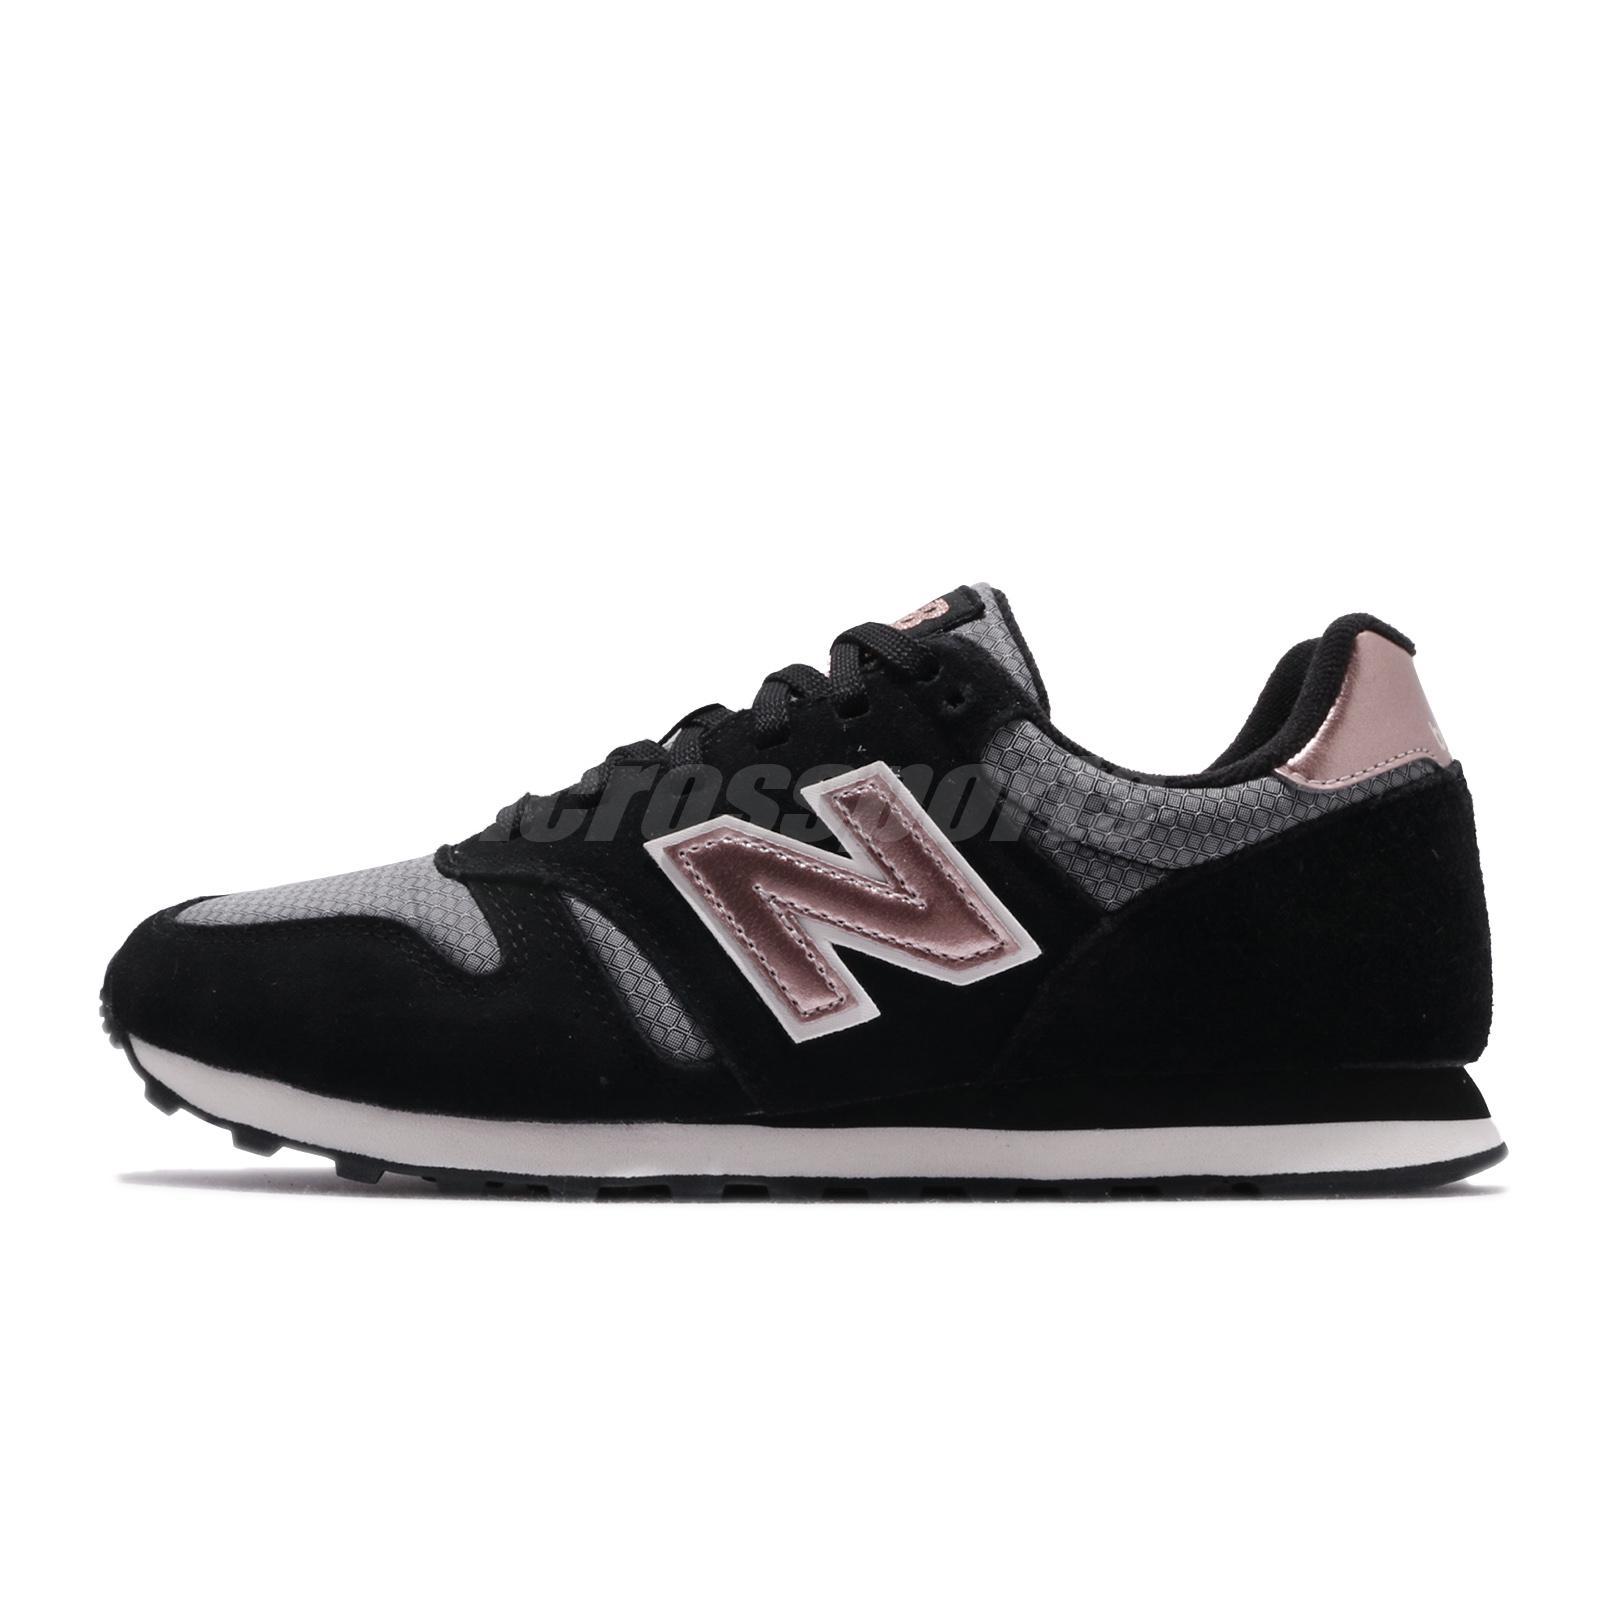 New Balance WL373JLA B 373 Black Grey